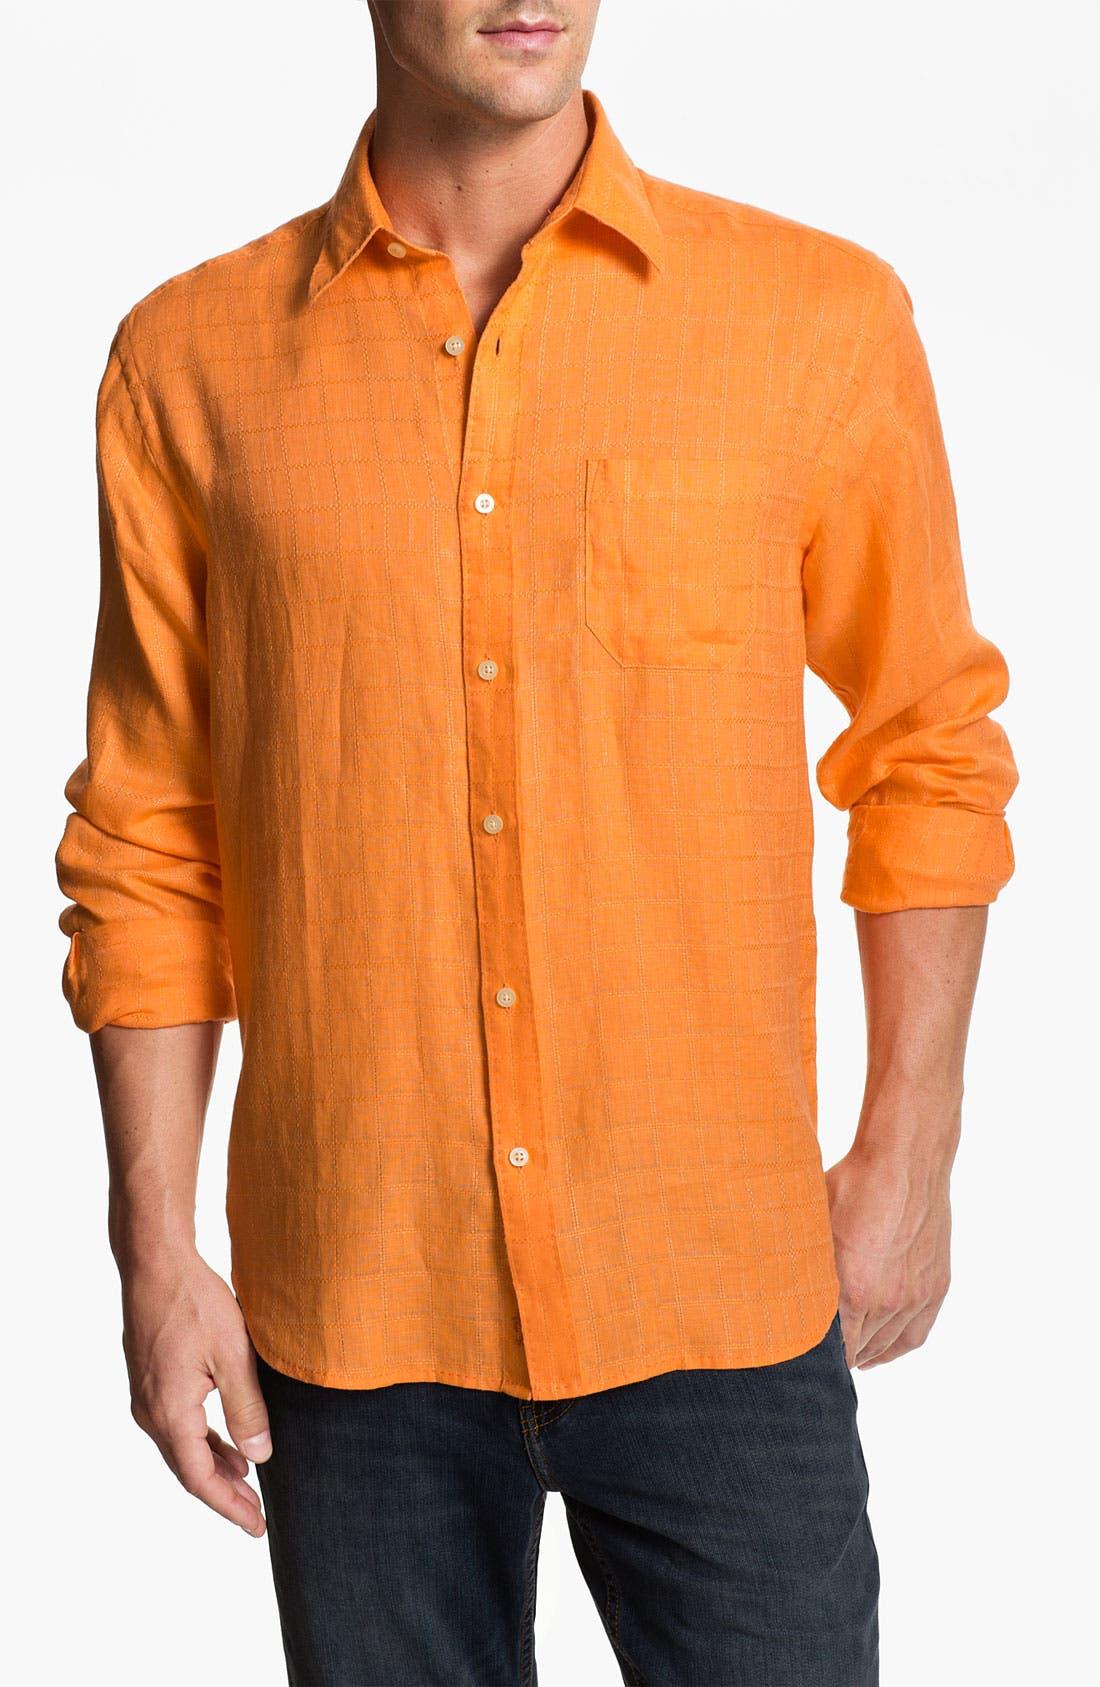 Main Image - Tommy Bahama 'Costa Sera' Linen Sport Shirt